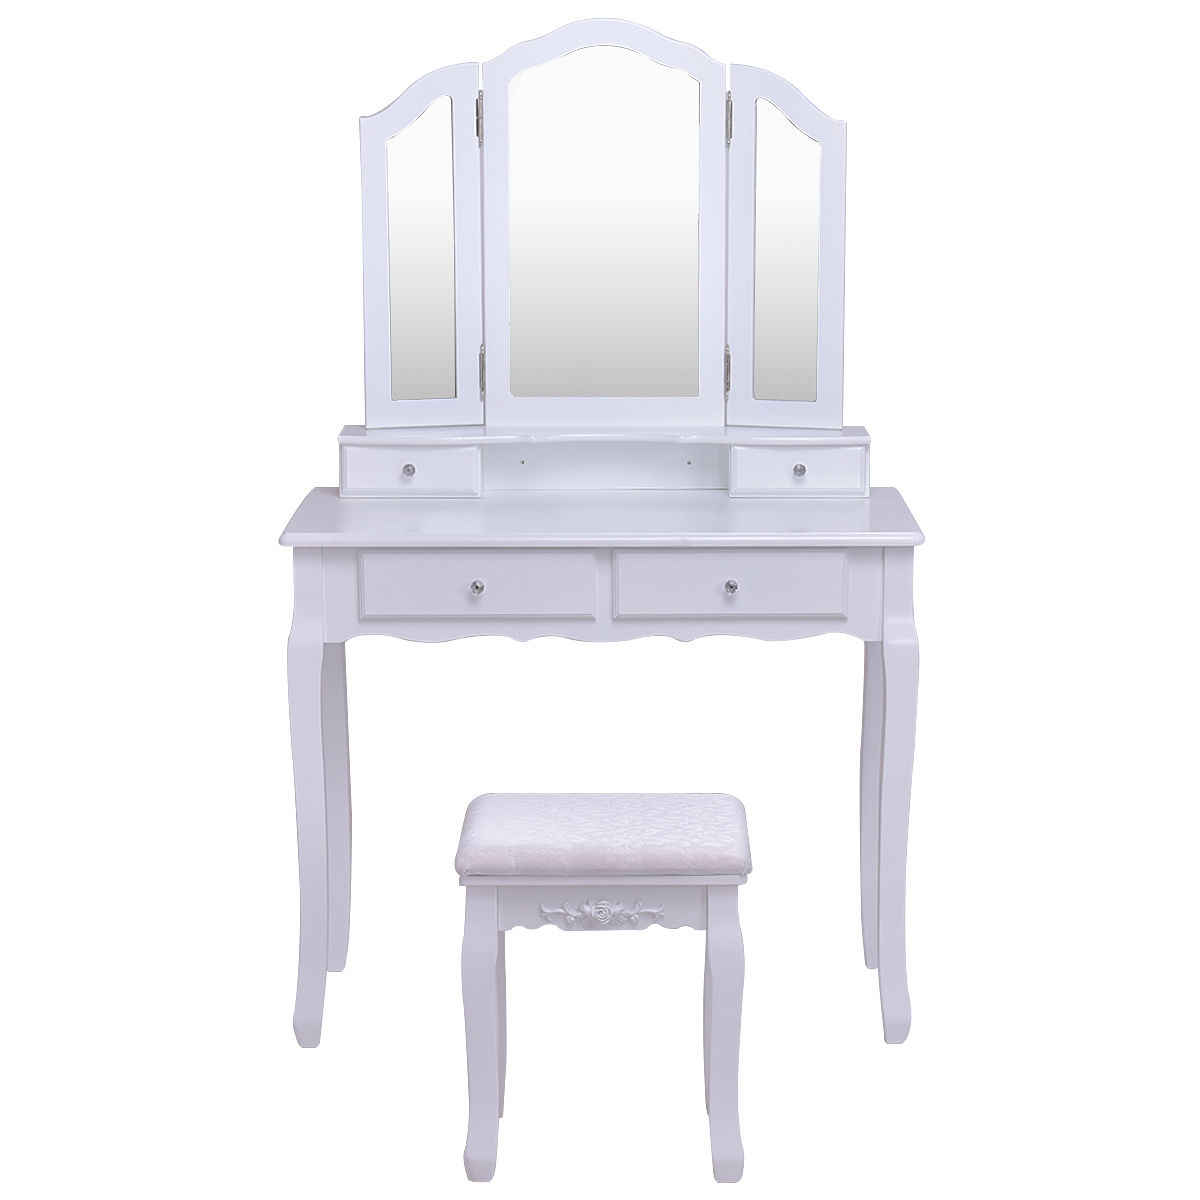 Giantex White Tri Folding Mirror Vanity Makeup Table Stool Set Home Desk With 4 Drawers Bedroom Modern Dresser HW55563WH